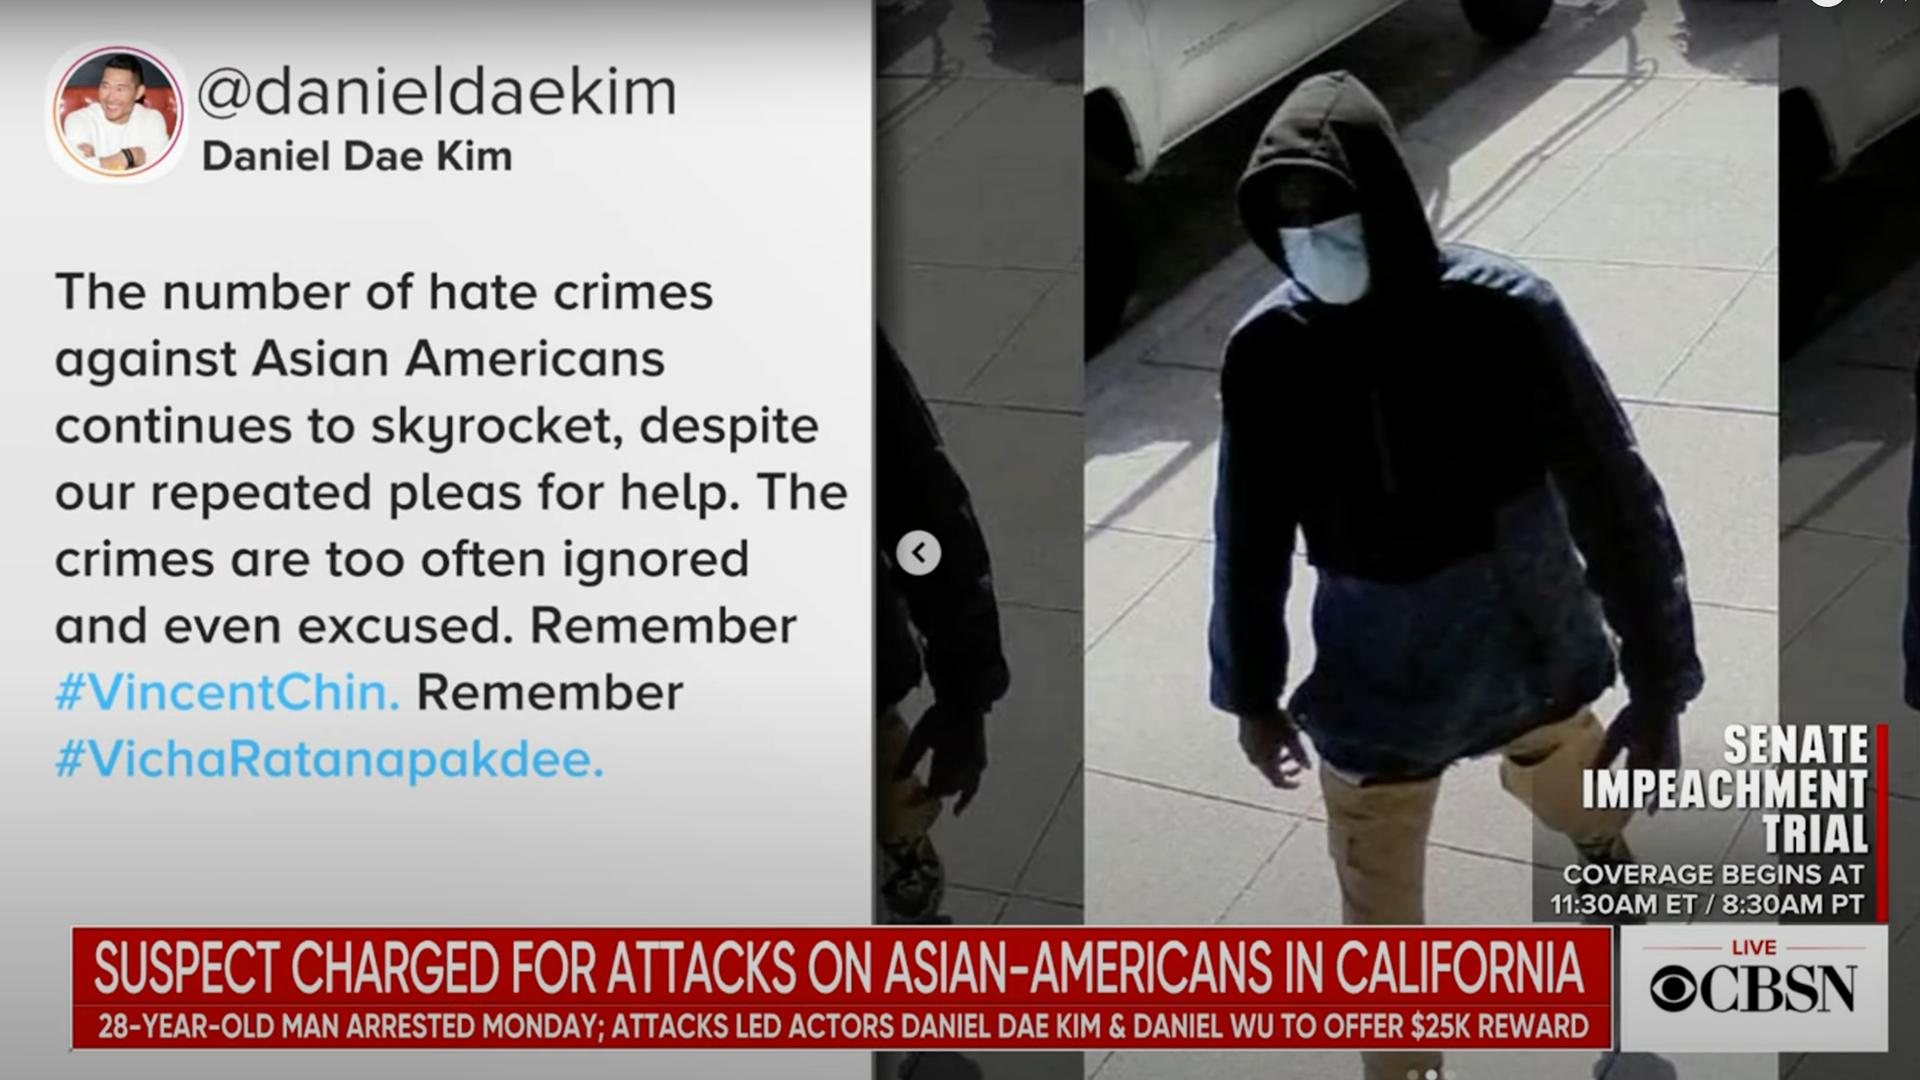 Recent attacks spark renewed focus on anti-Asian violence